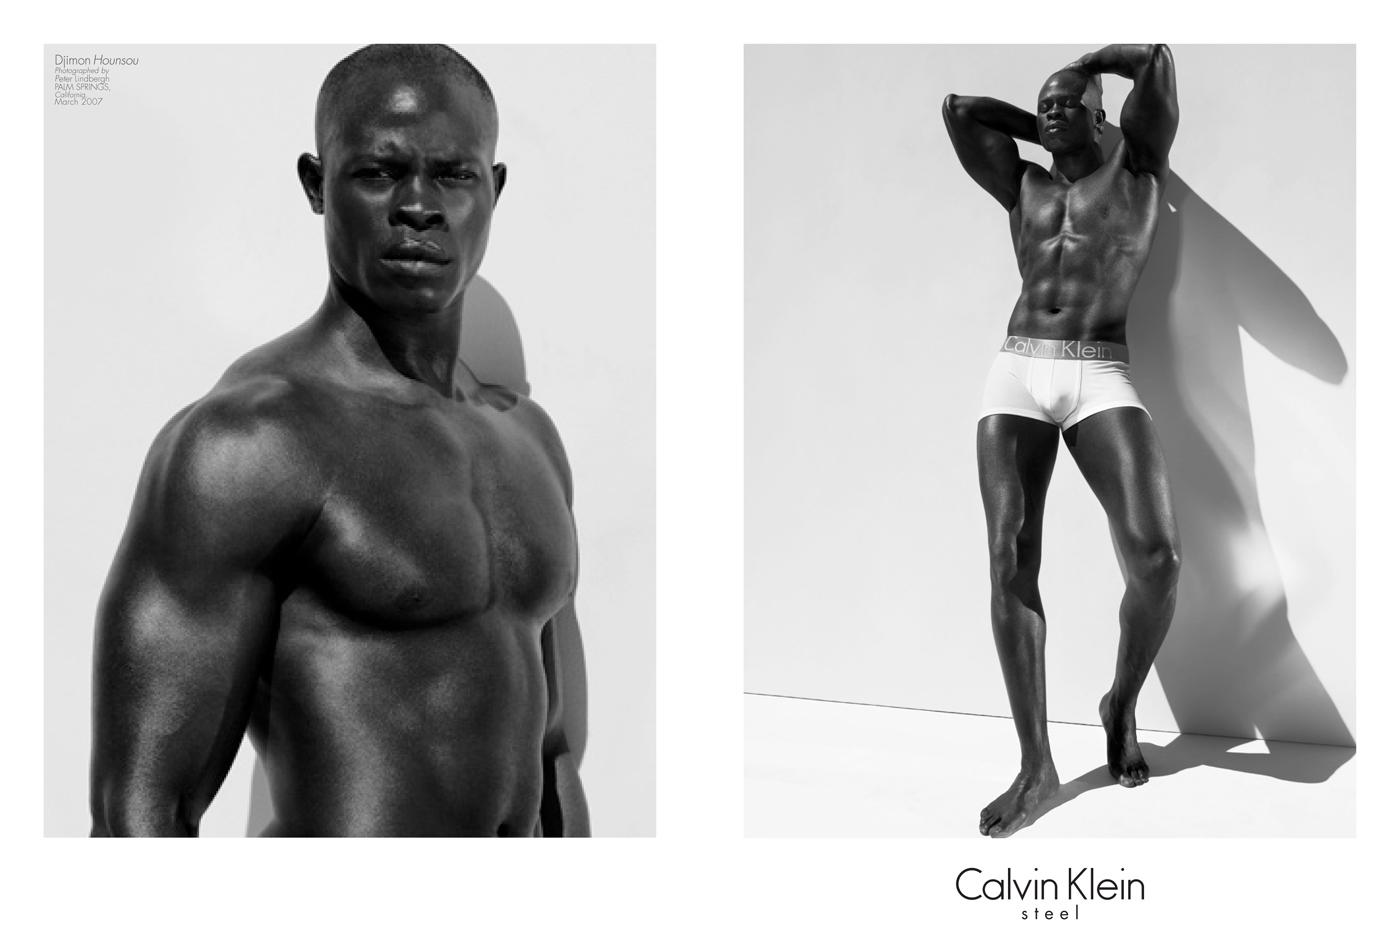 celebrity calvin klein underwear ads djimon hounsou